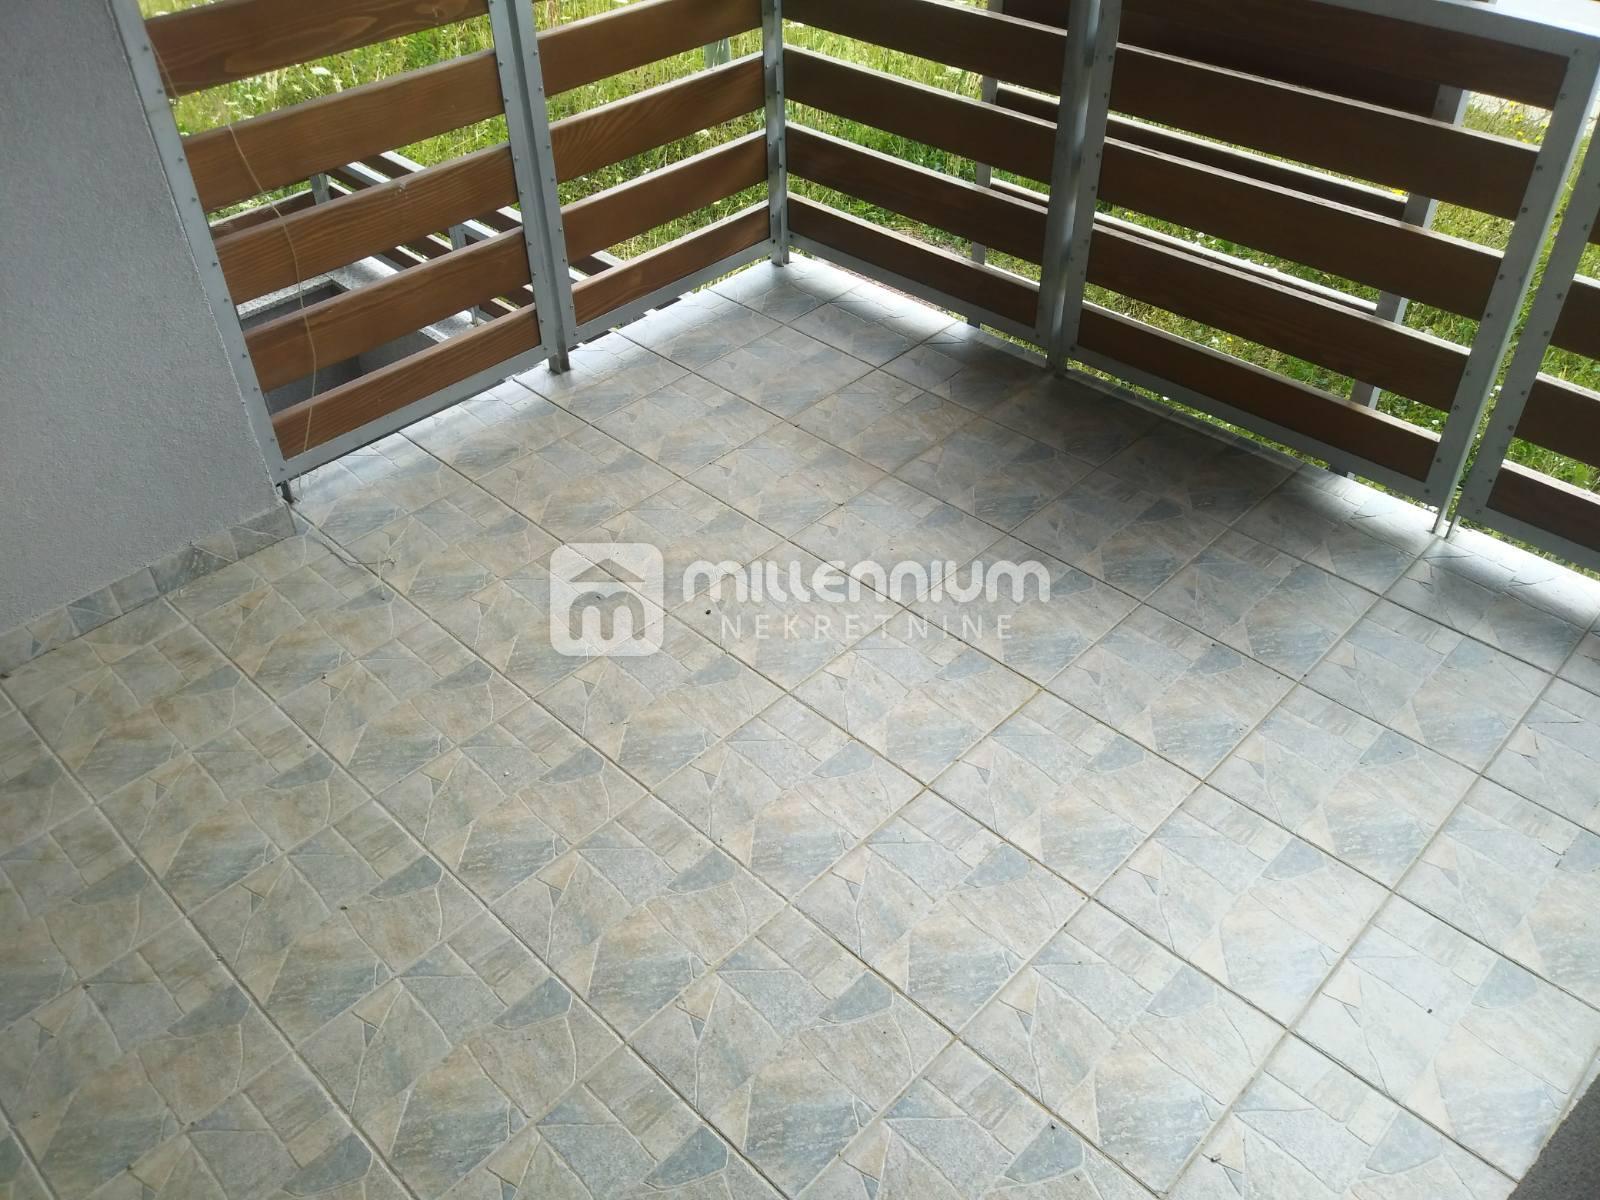 Gorski Kotar, Mrkopalj, namješten apartman za 43.000€/hrk